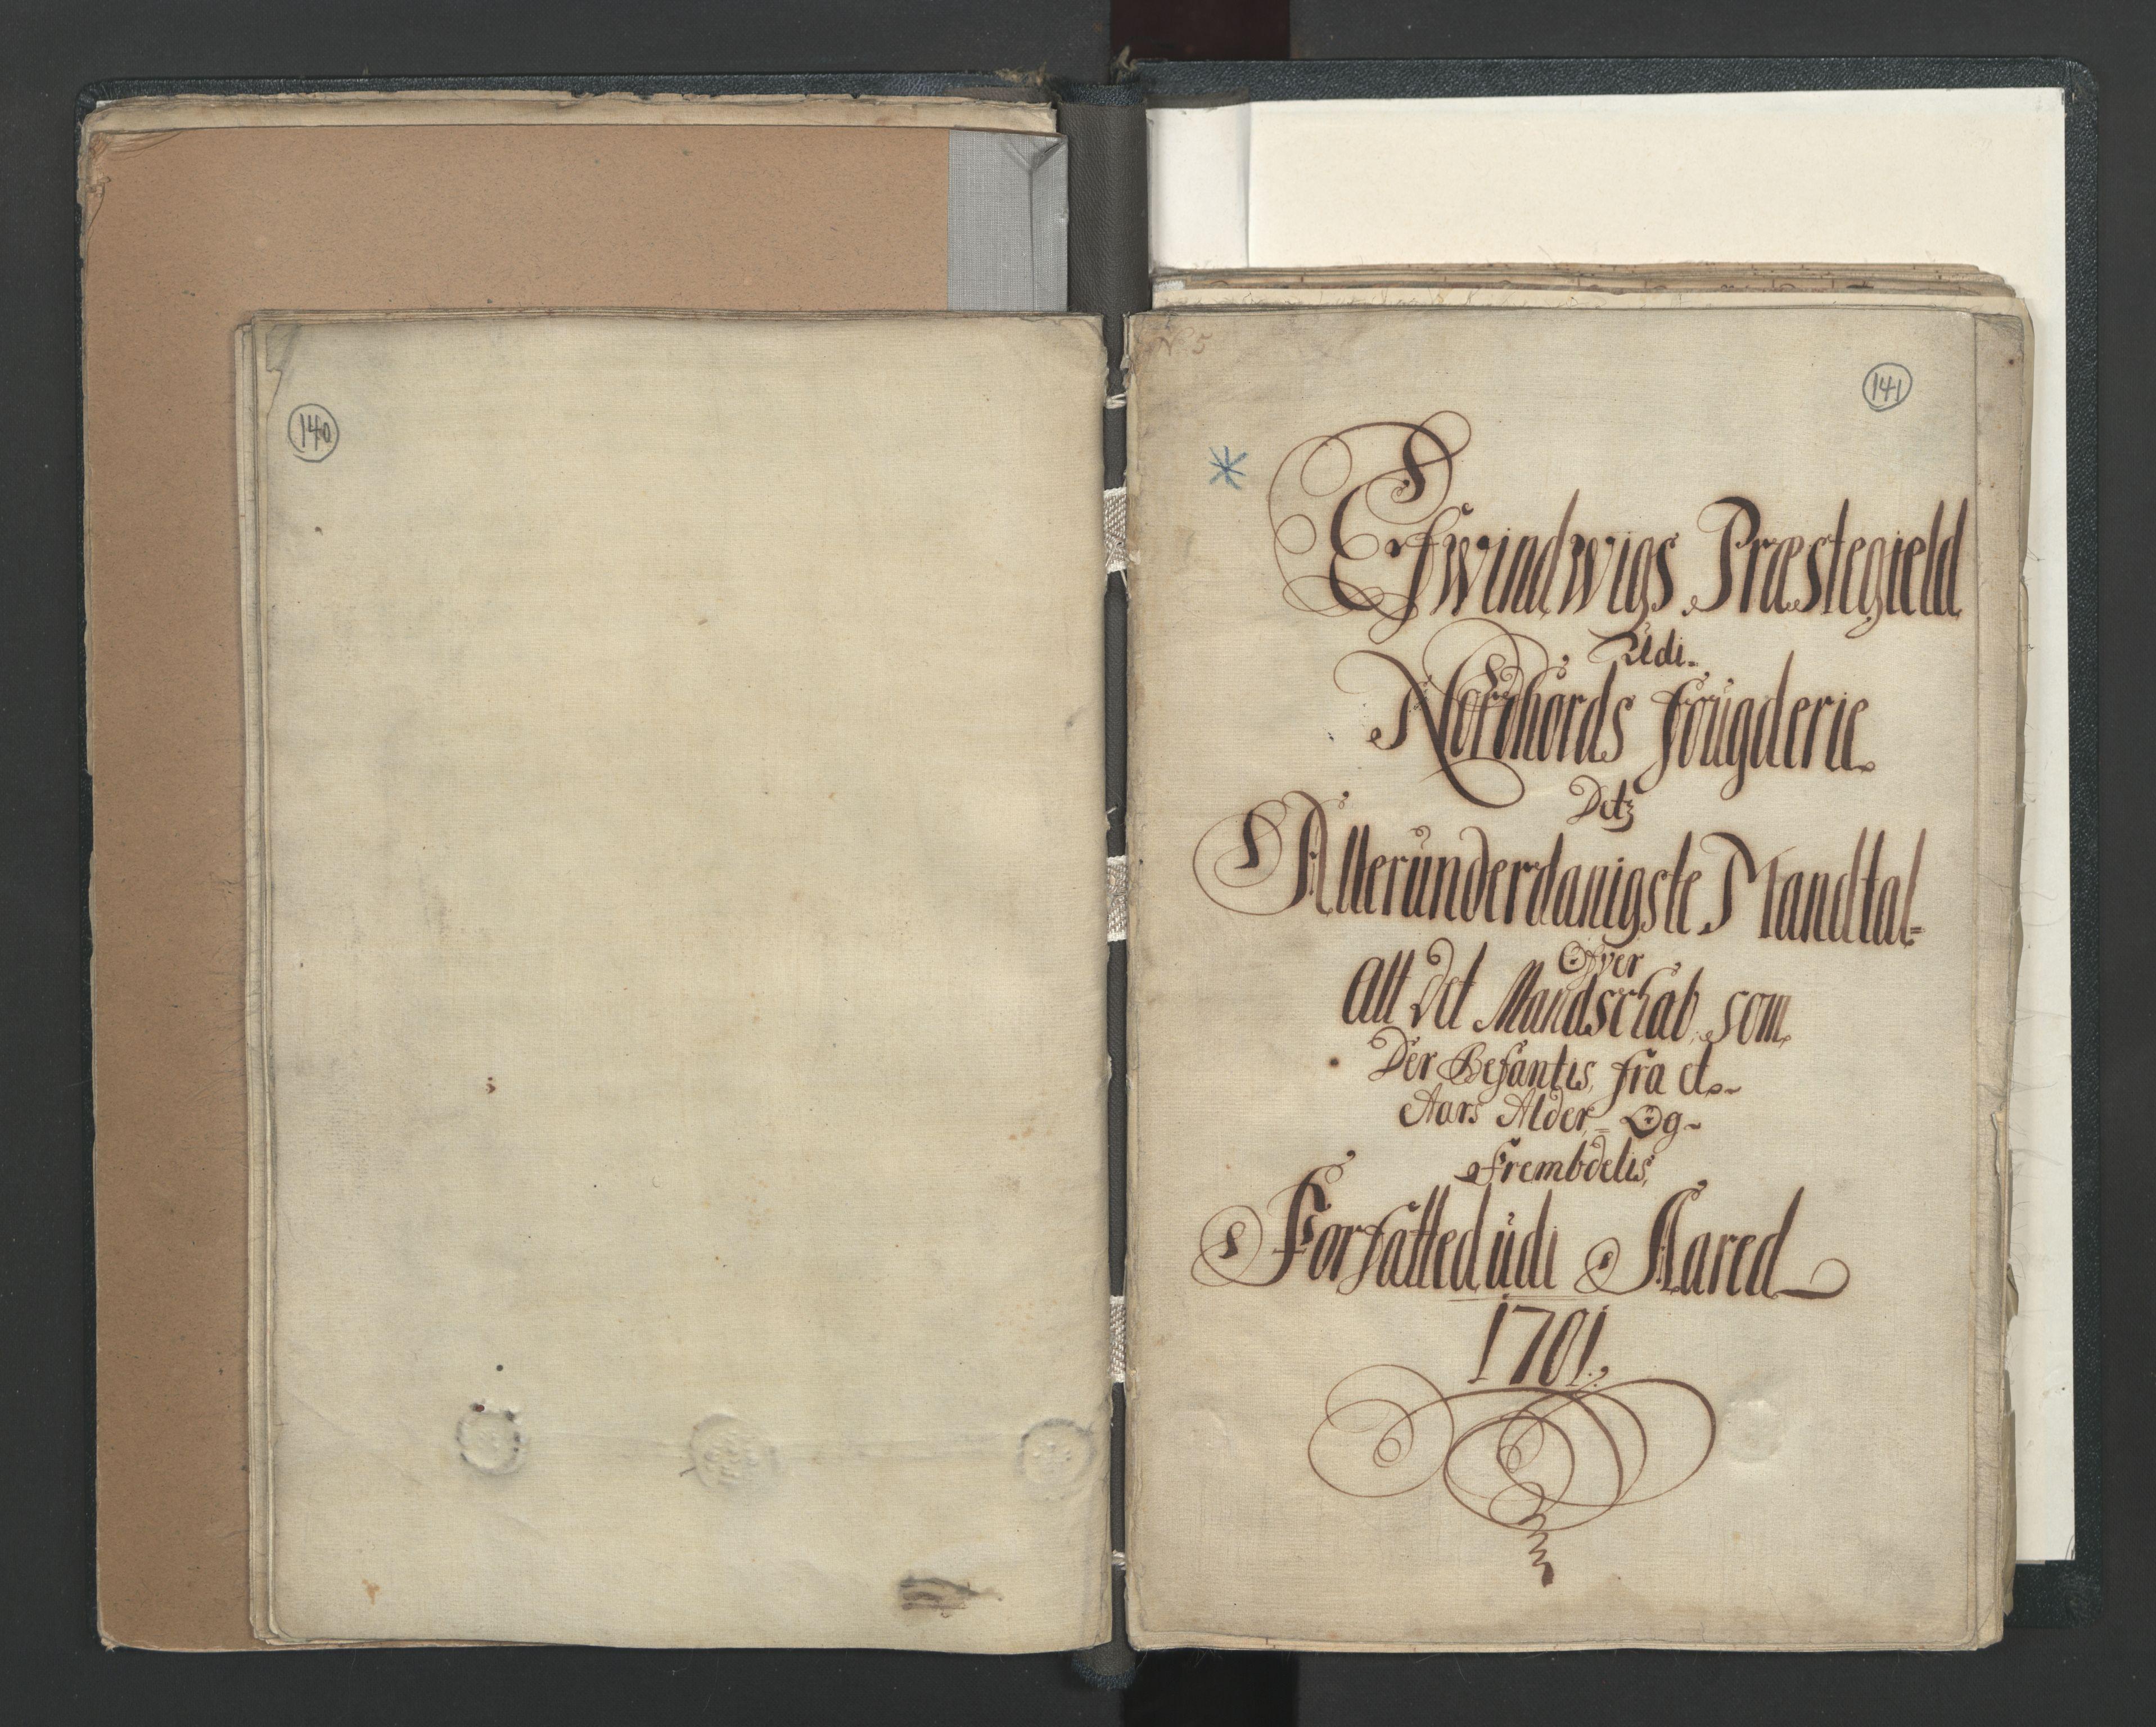 RA, Manntallet 1701, nr. 7: Nordhordland og Voss fogderi, 1701, s. 140-141